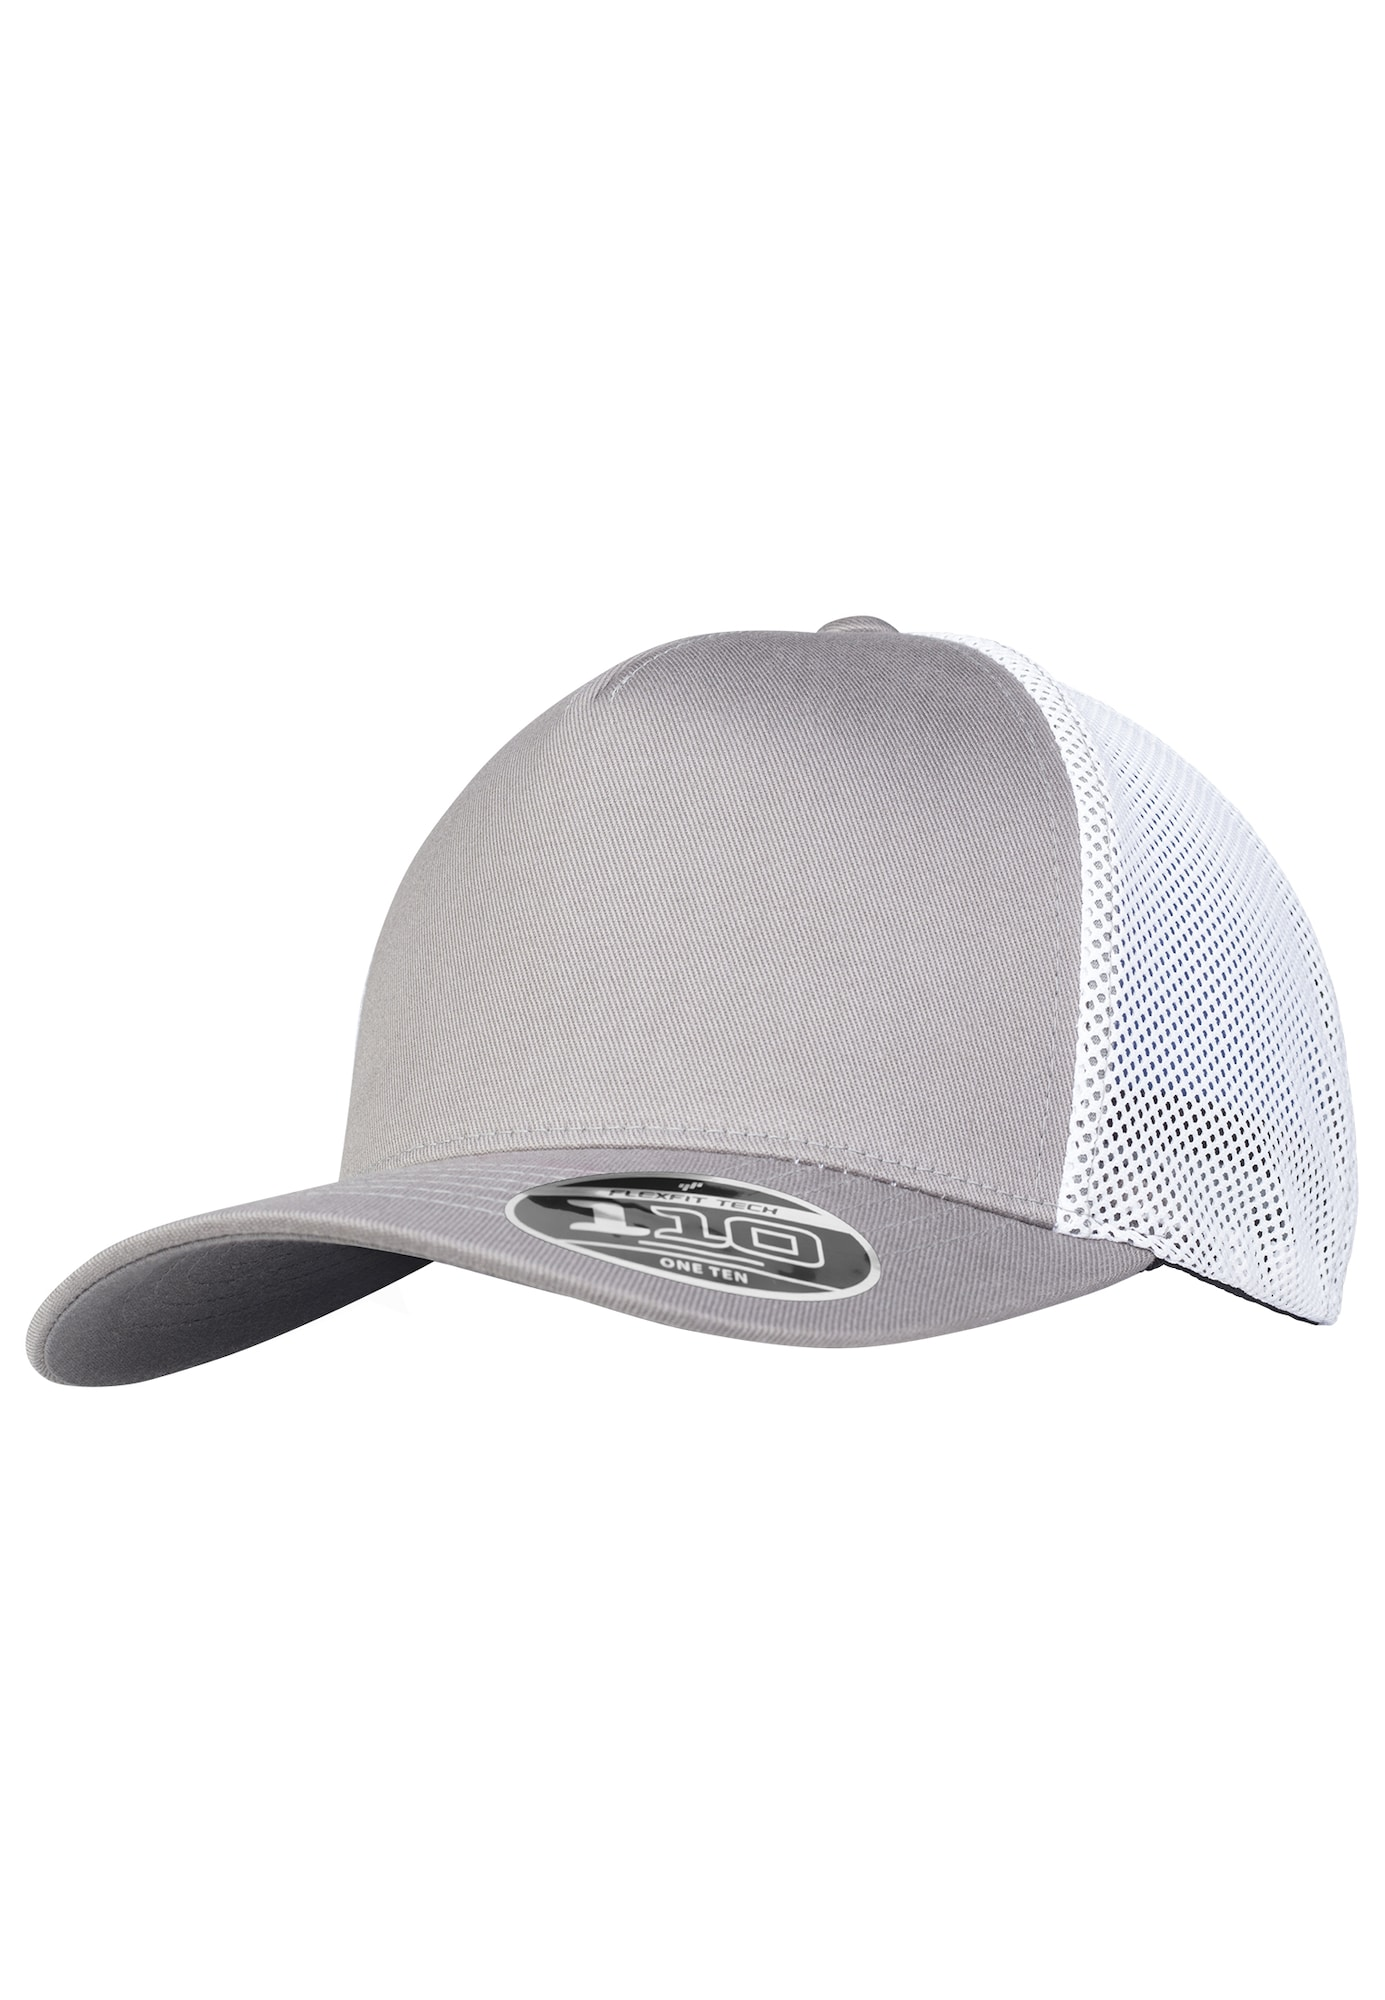 Cap '110 Trucker' | Accessoires > Caps > Sonstige Caps | Flexfit